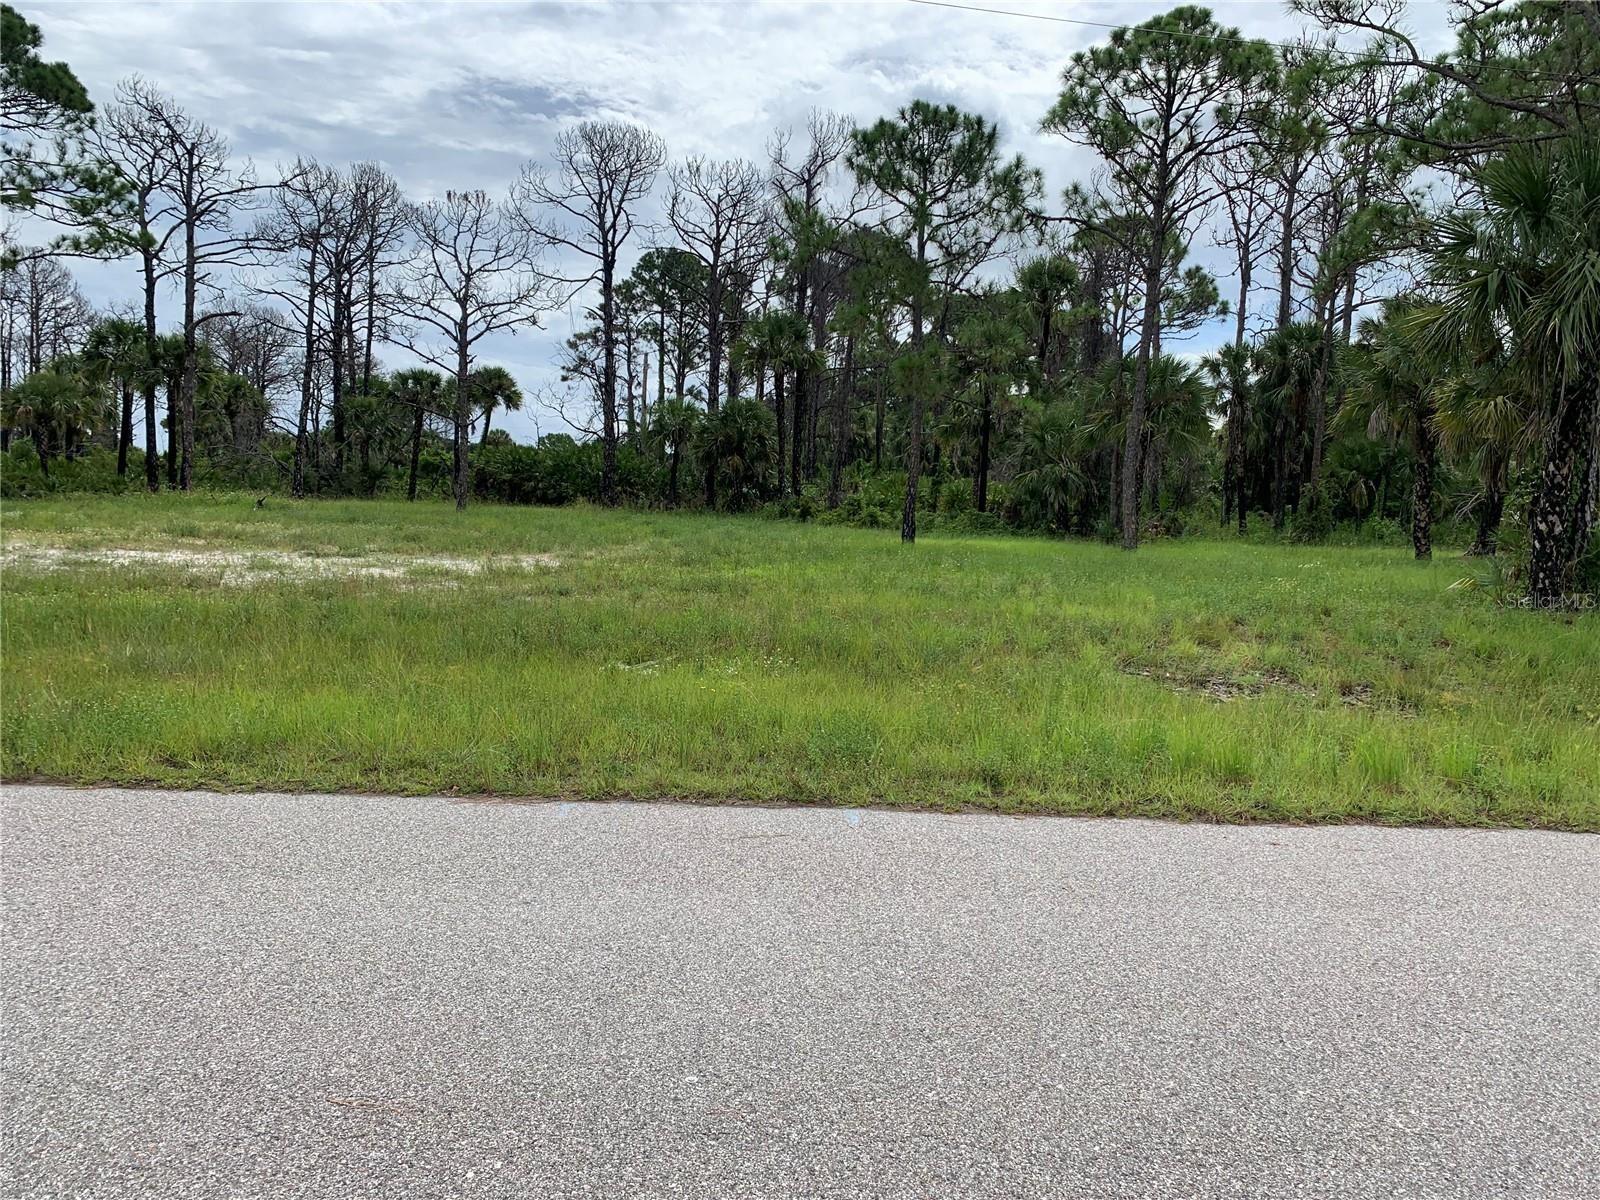 Photo of 5 MATE DRIVE, PLACIDA, FL 33946 (MLS # C7448833)